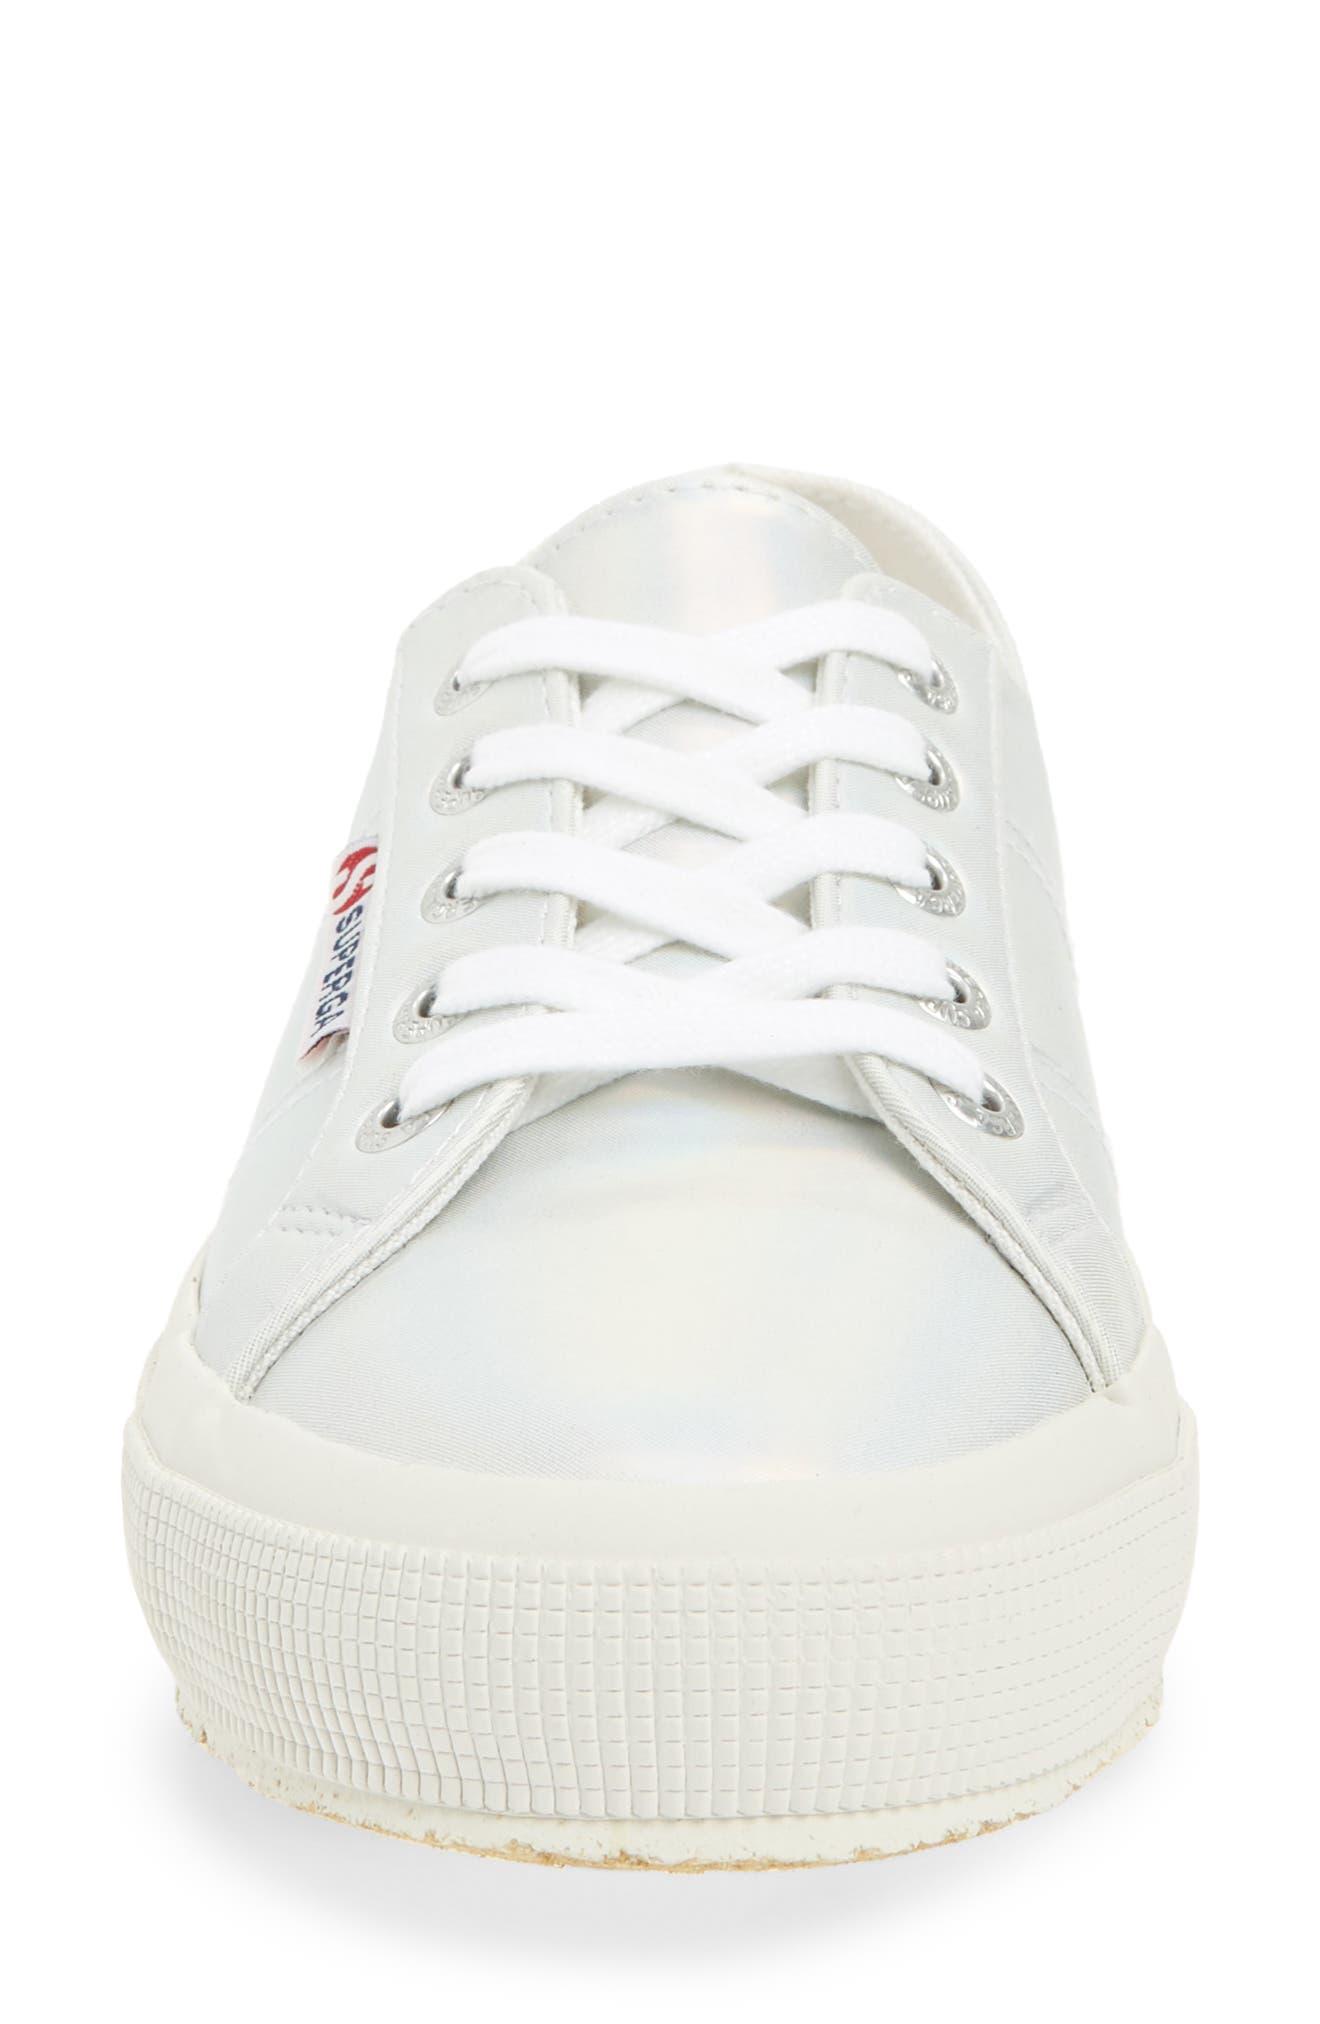 2750 Hologramw Low Top Sneaker,                             Alternate thumbnail 4, color,                             Iridescent